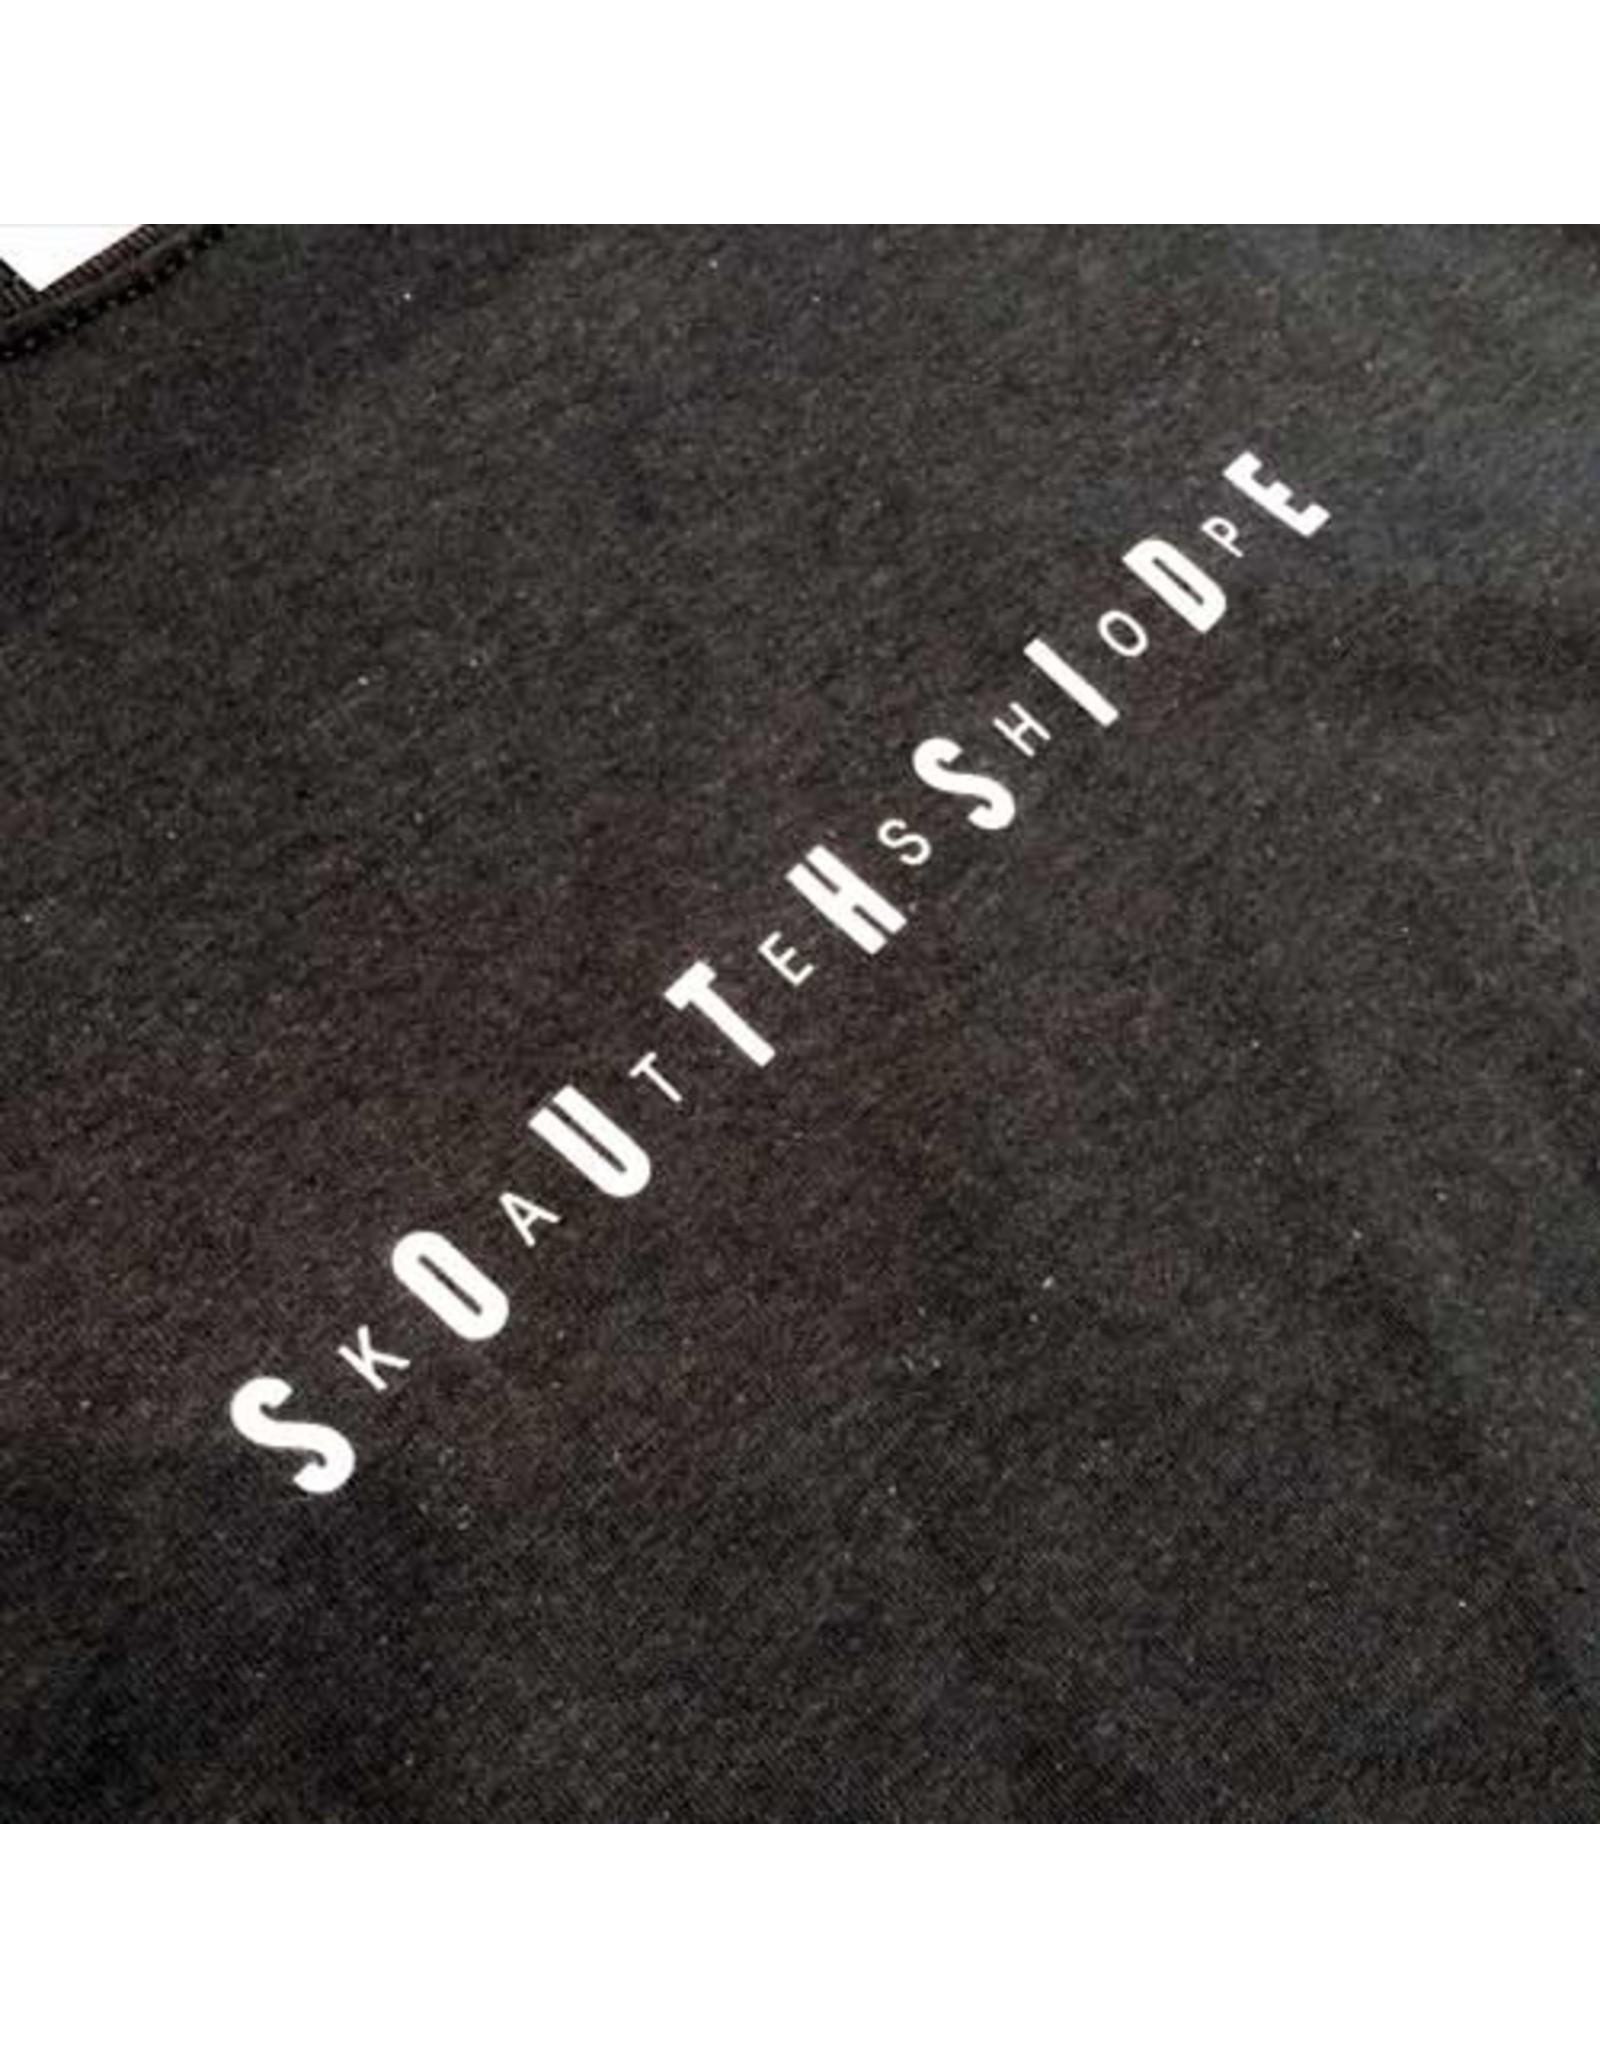 Southside Southside Skateshop Simplicity Black